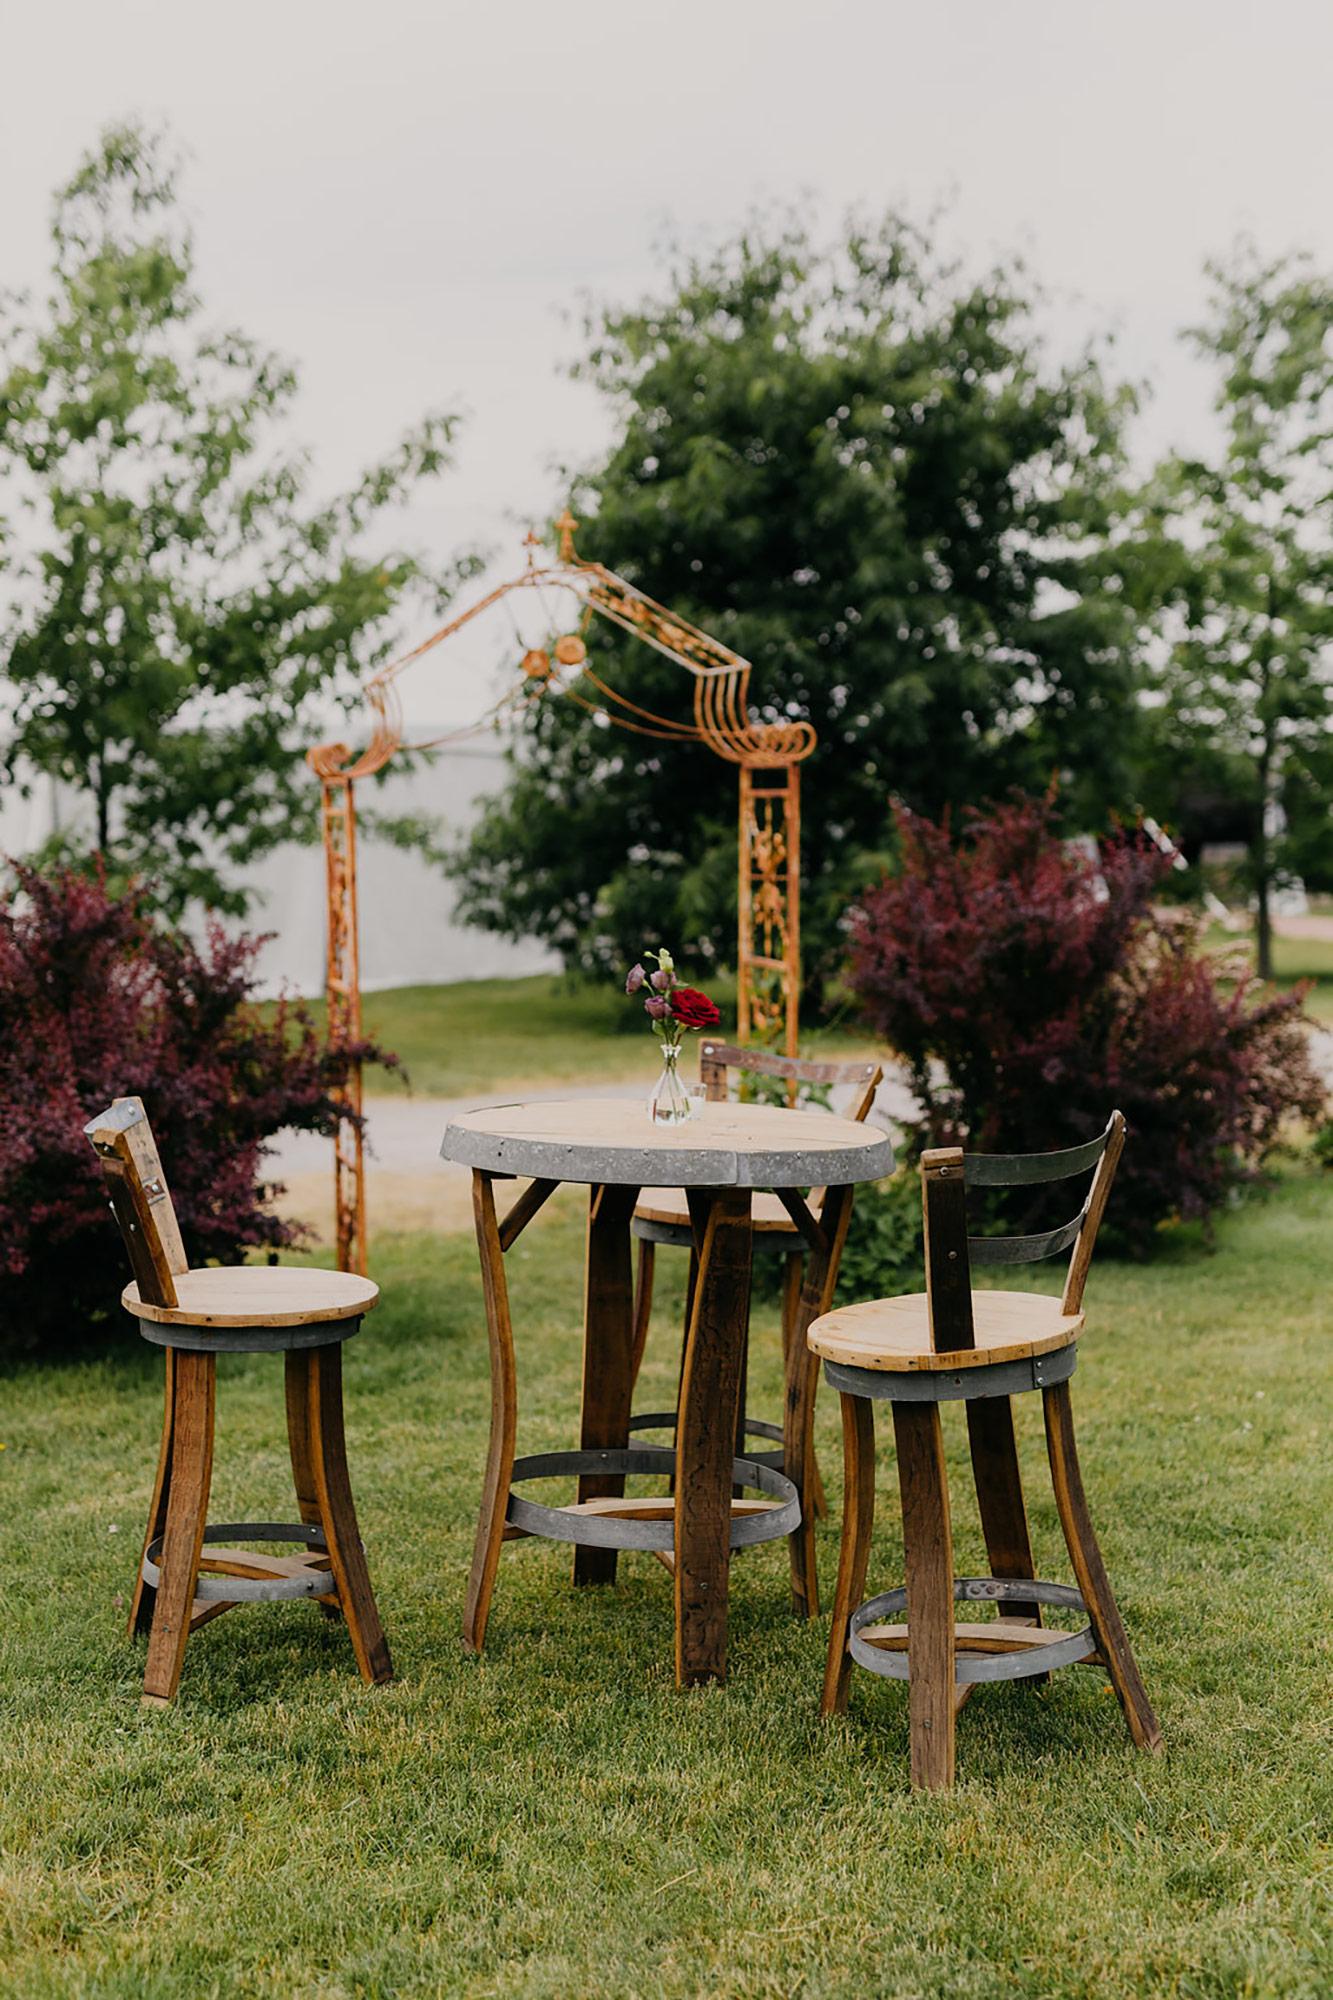 Kurtz-Orchards-Wedding-Niagara-wedding-Vineyard-Bride-Photography-by-Kayla-Rocca-022.JPG